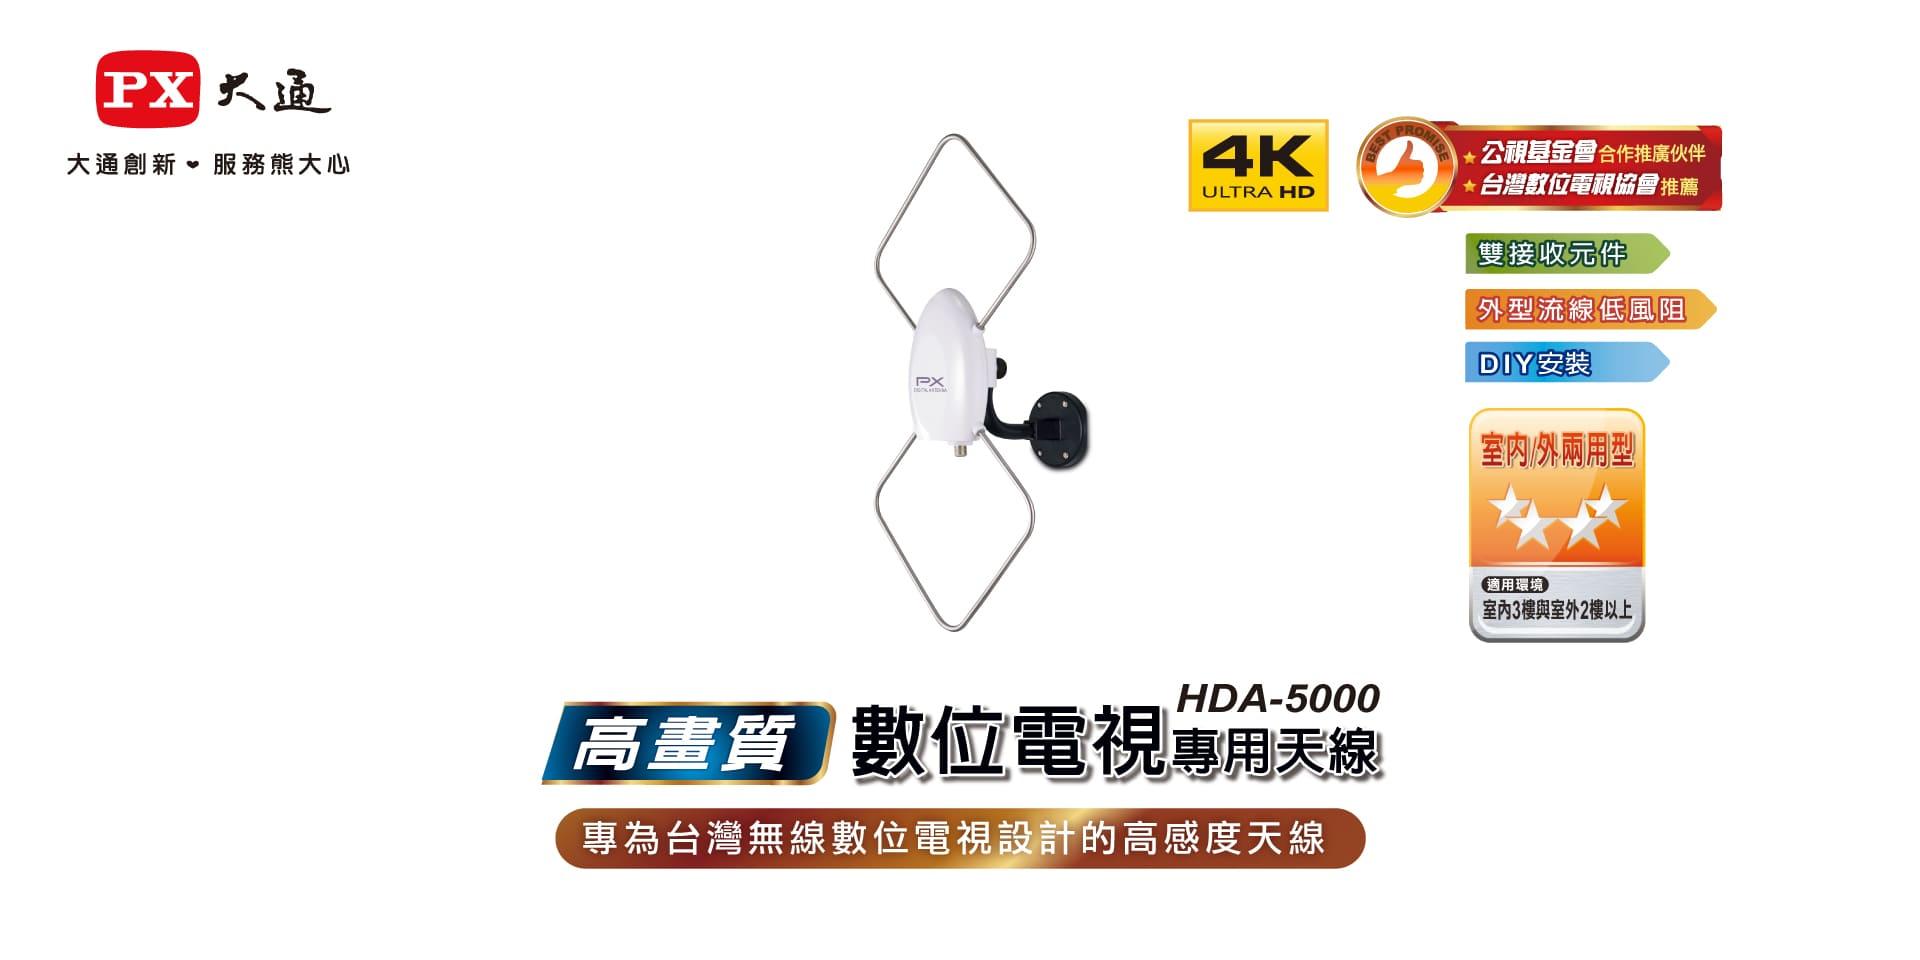 proimages/product/Antenna/HDA-5000/HDA-5000-01.jpg